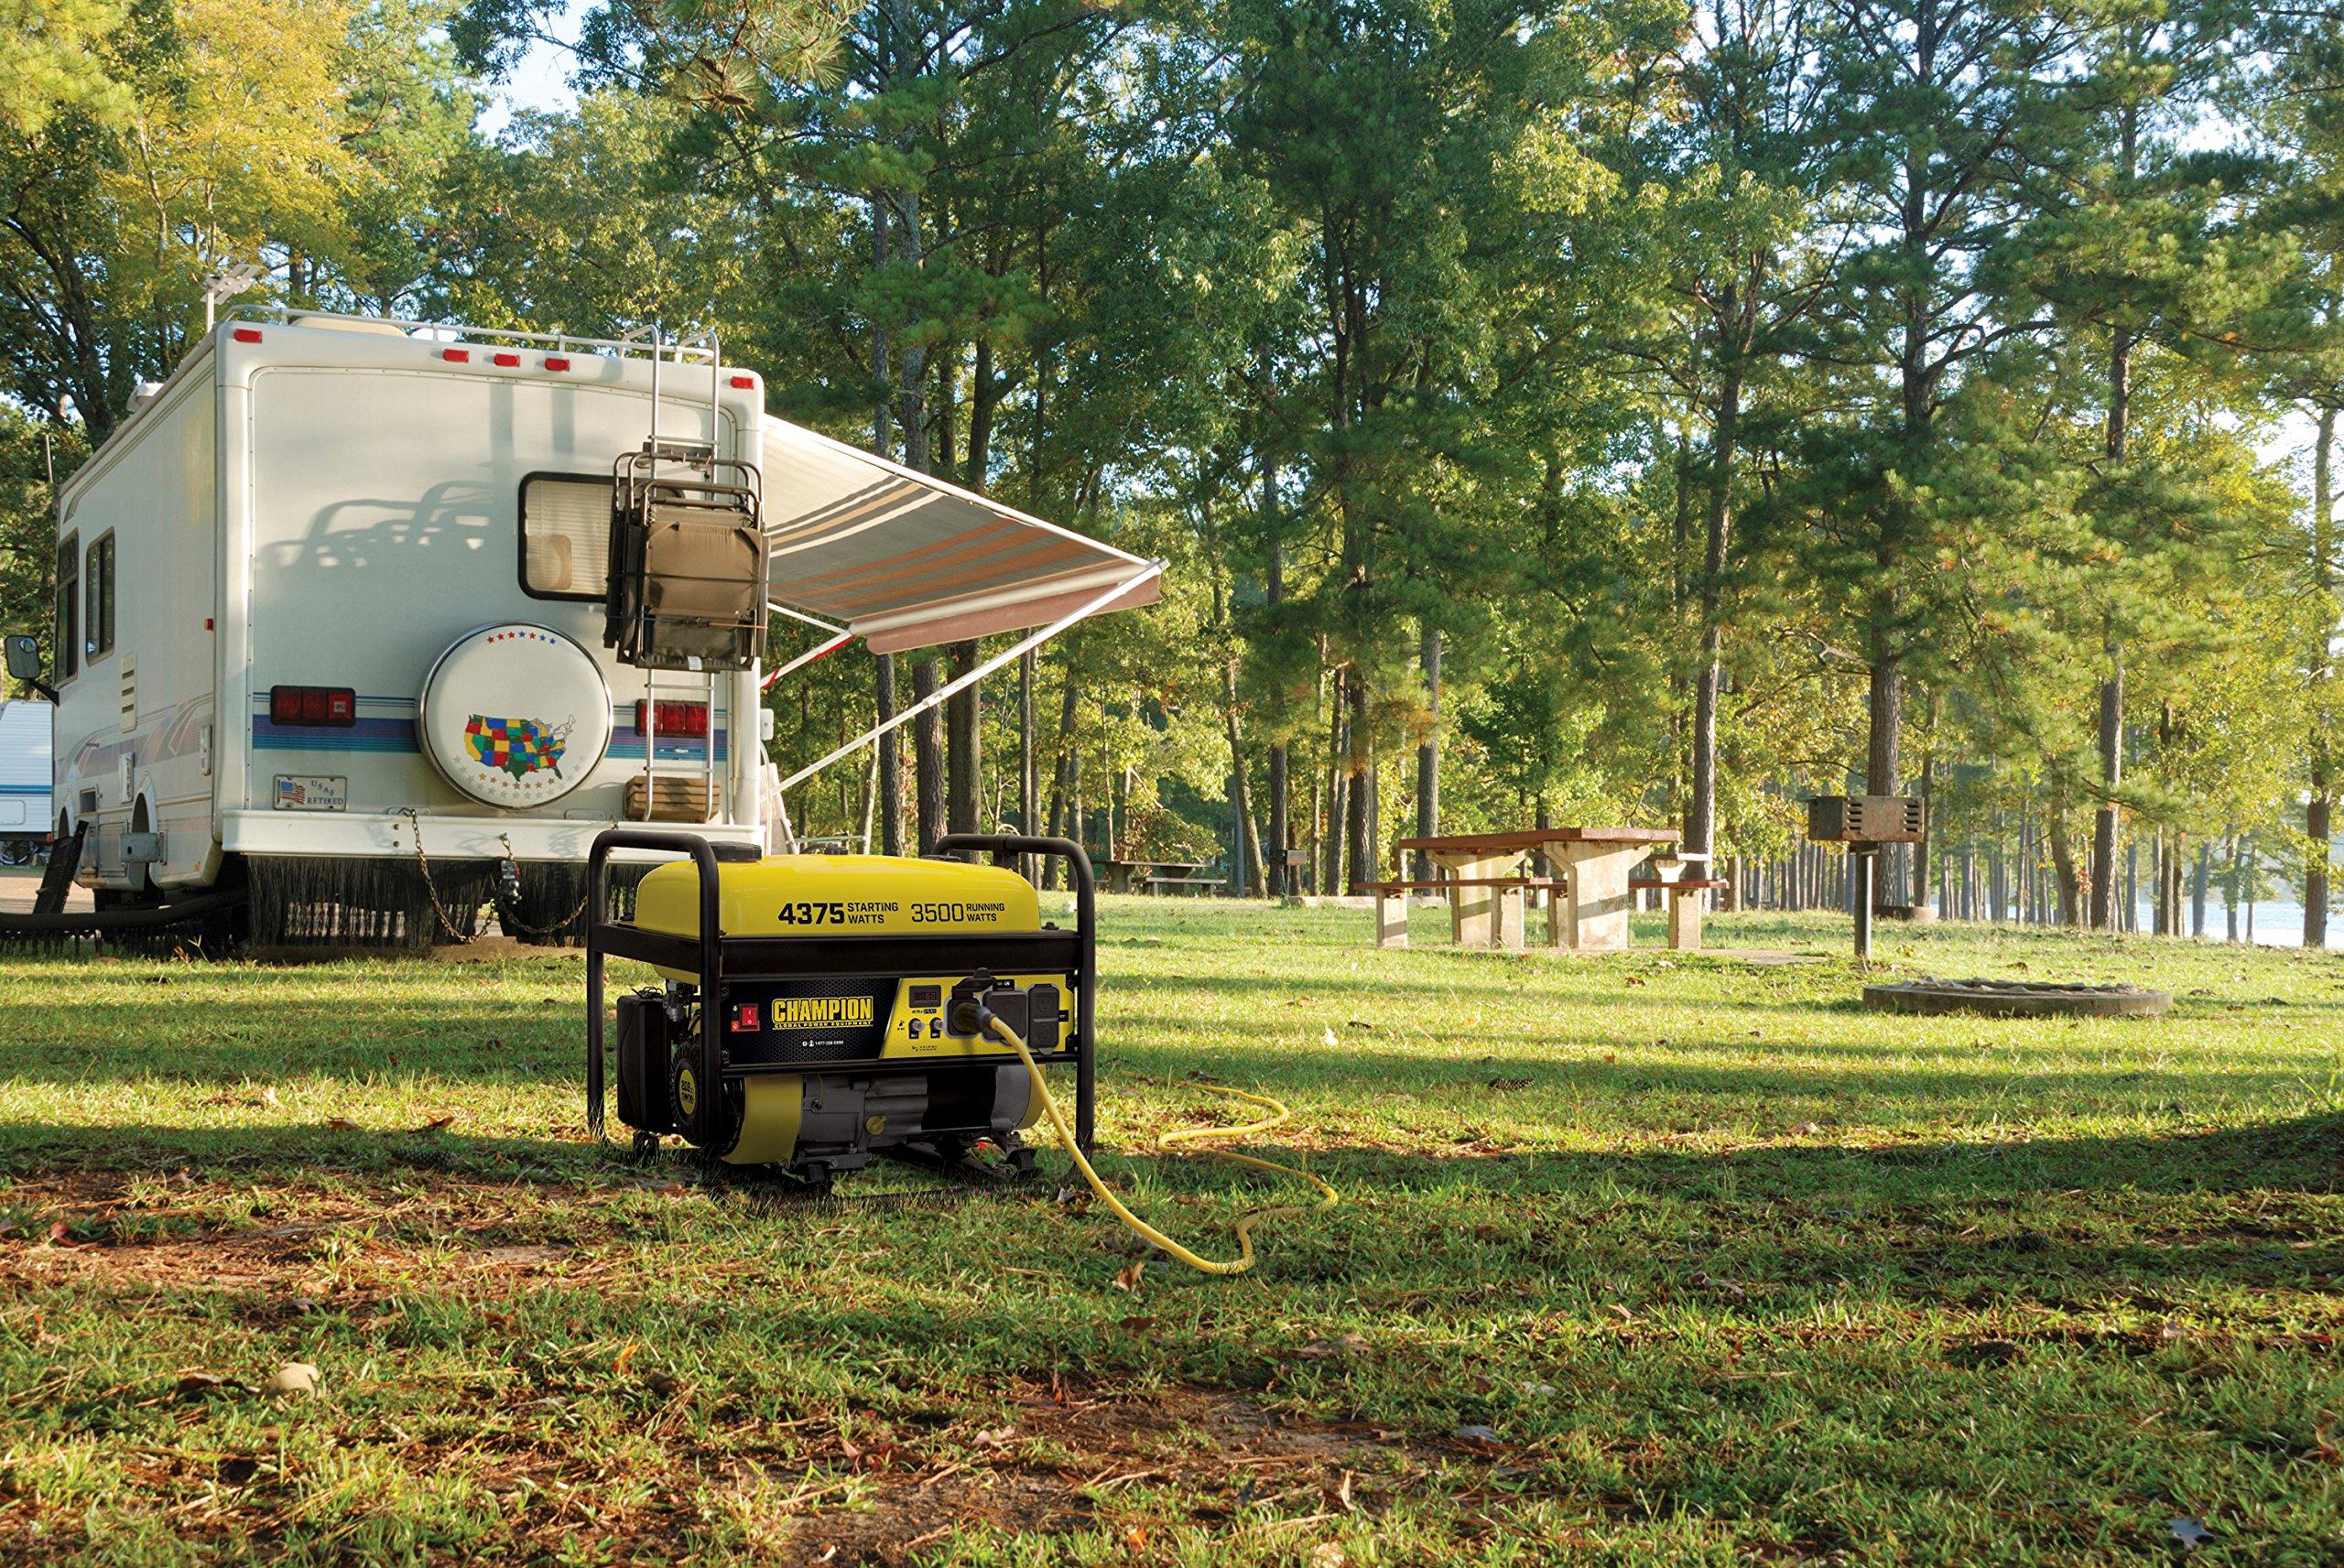 Champion Power Equipment 100555 RV Ready Portable Generator, Yellow and Black by Champion Power Equipment (Image #4)